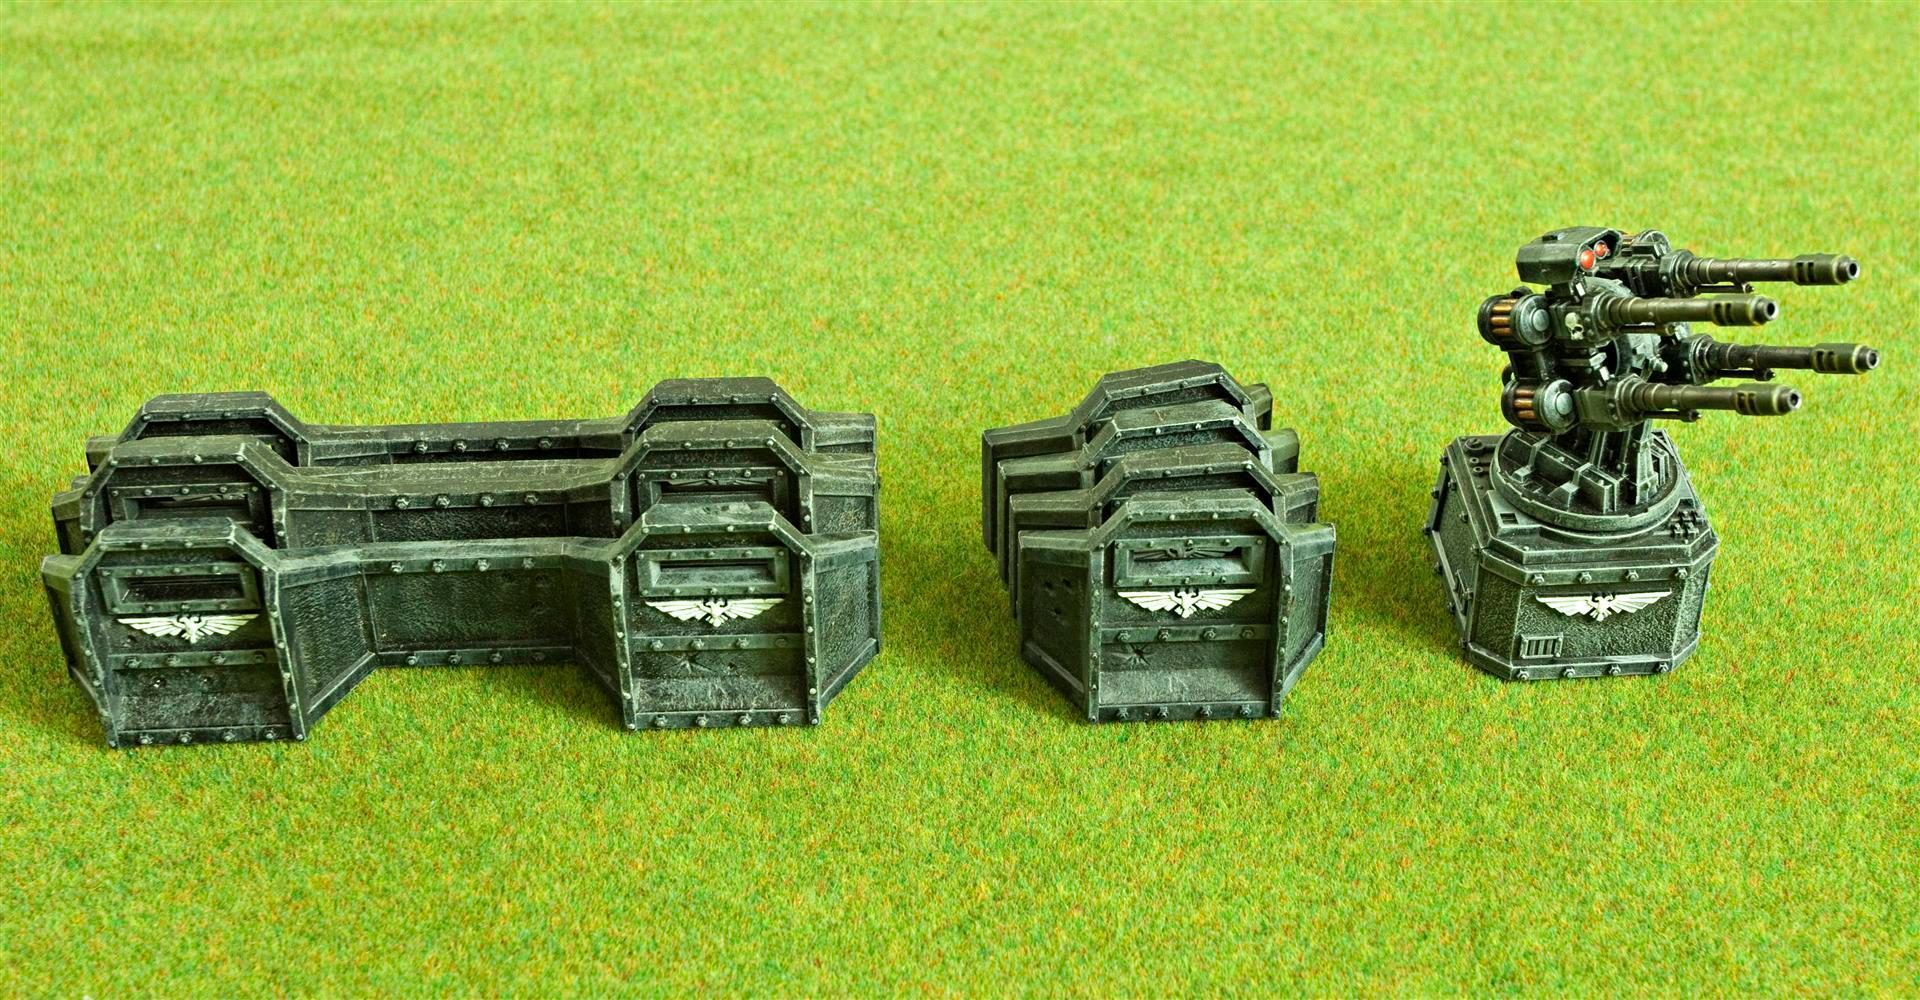 Astra Militarum, Guard, Imperial, Imperial Guard, Warhammer 40,000